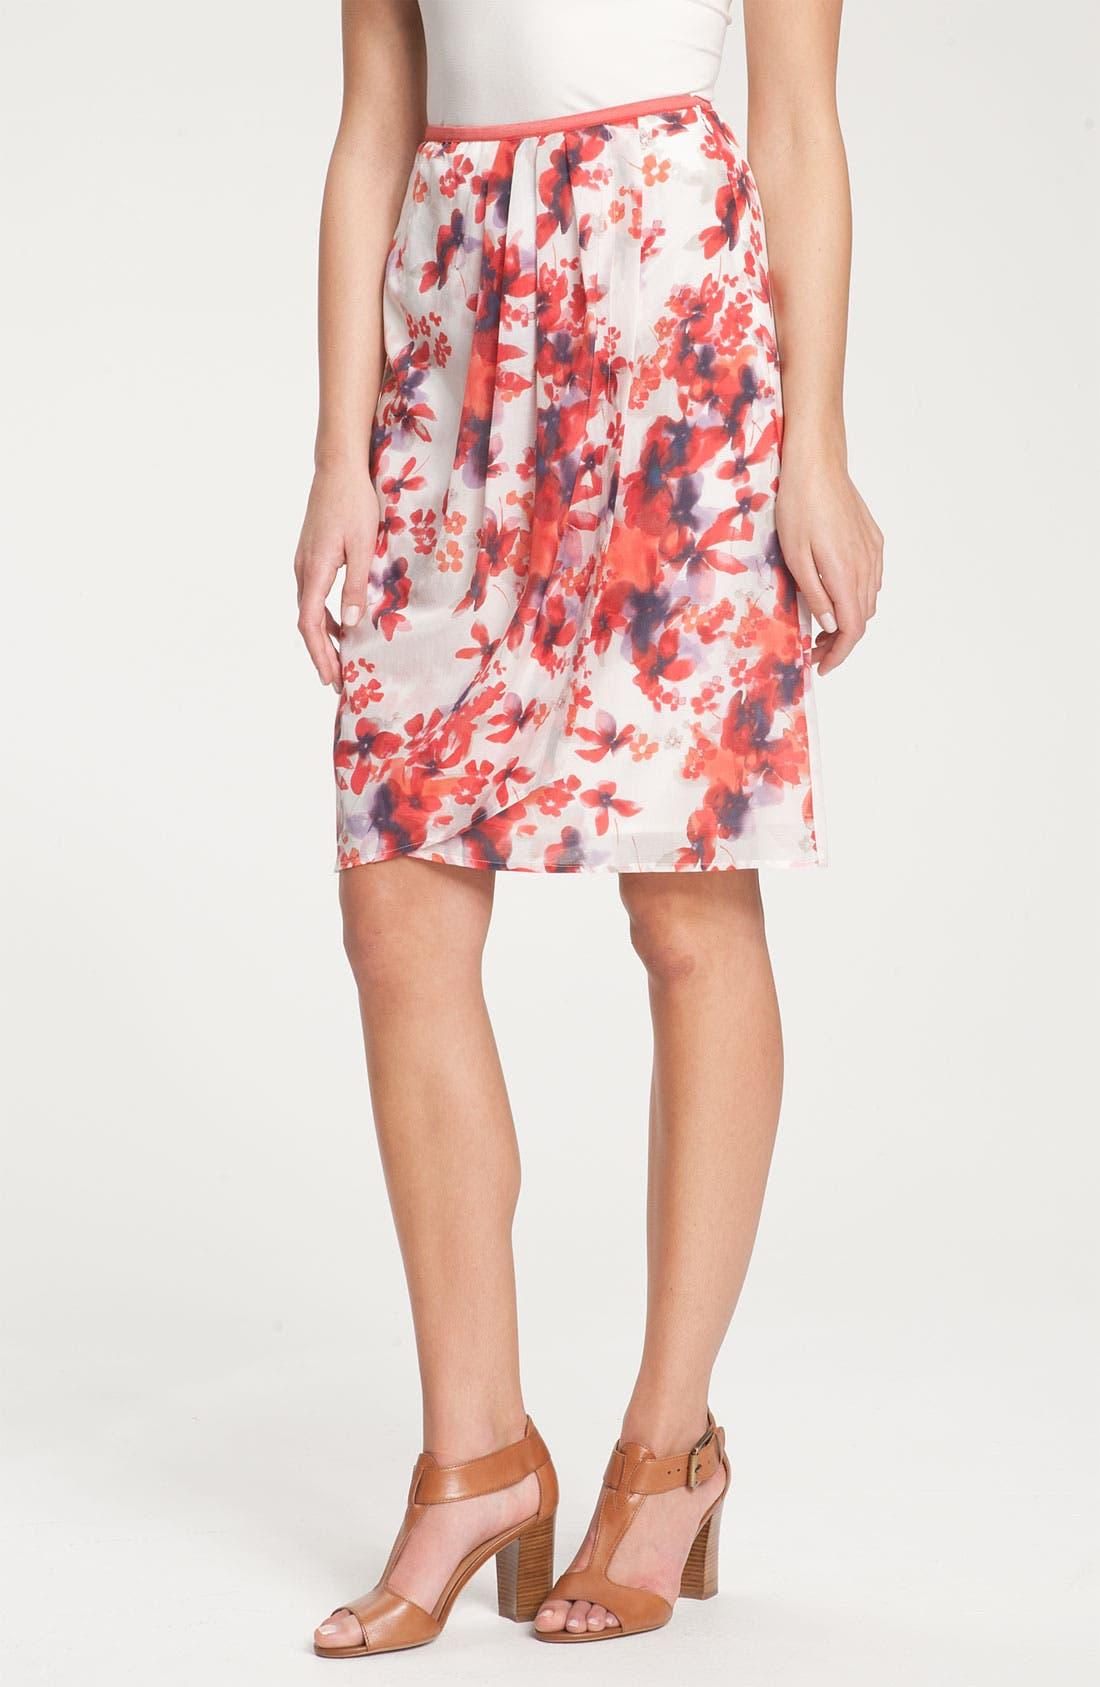 Alternate Image 1 Selected - Nic + Zoe 'Blushing Floral' Skirt